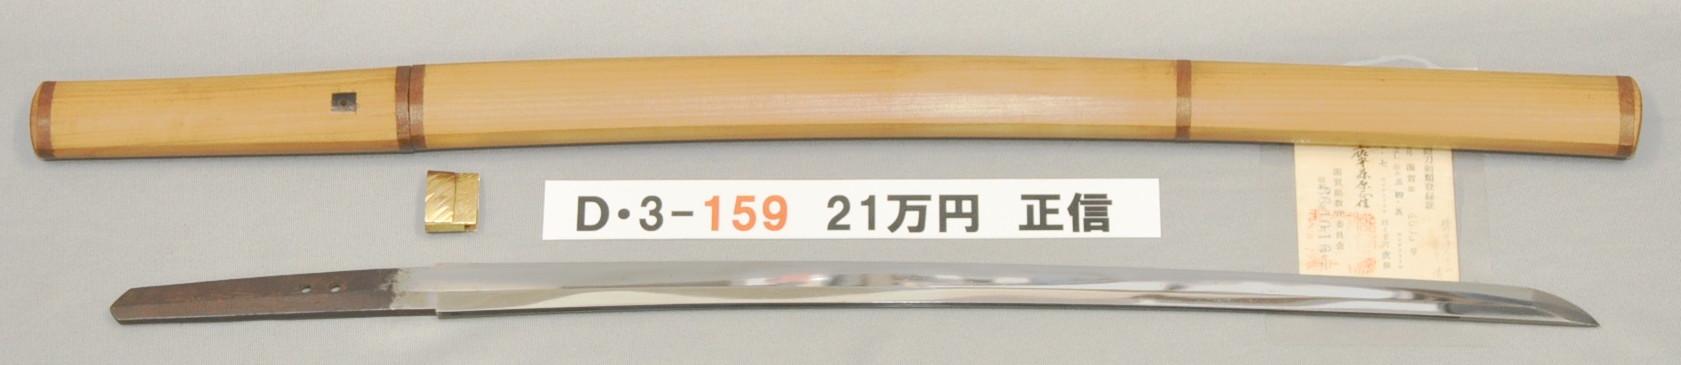 D3159